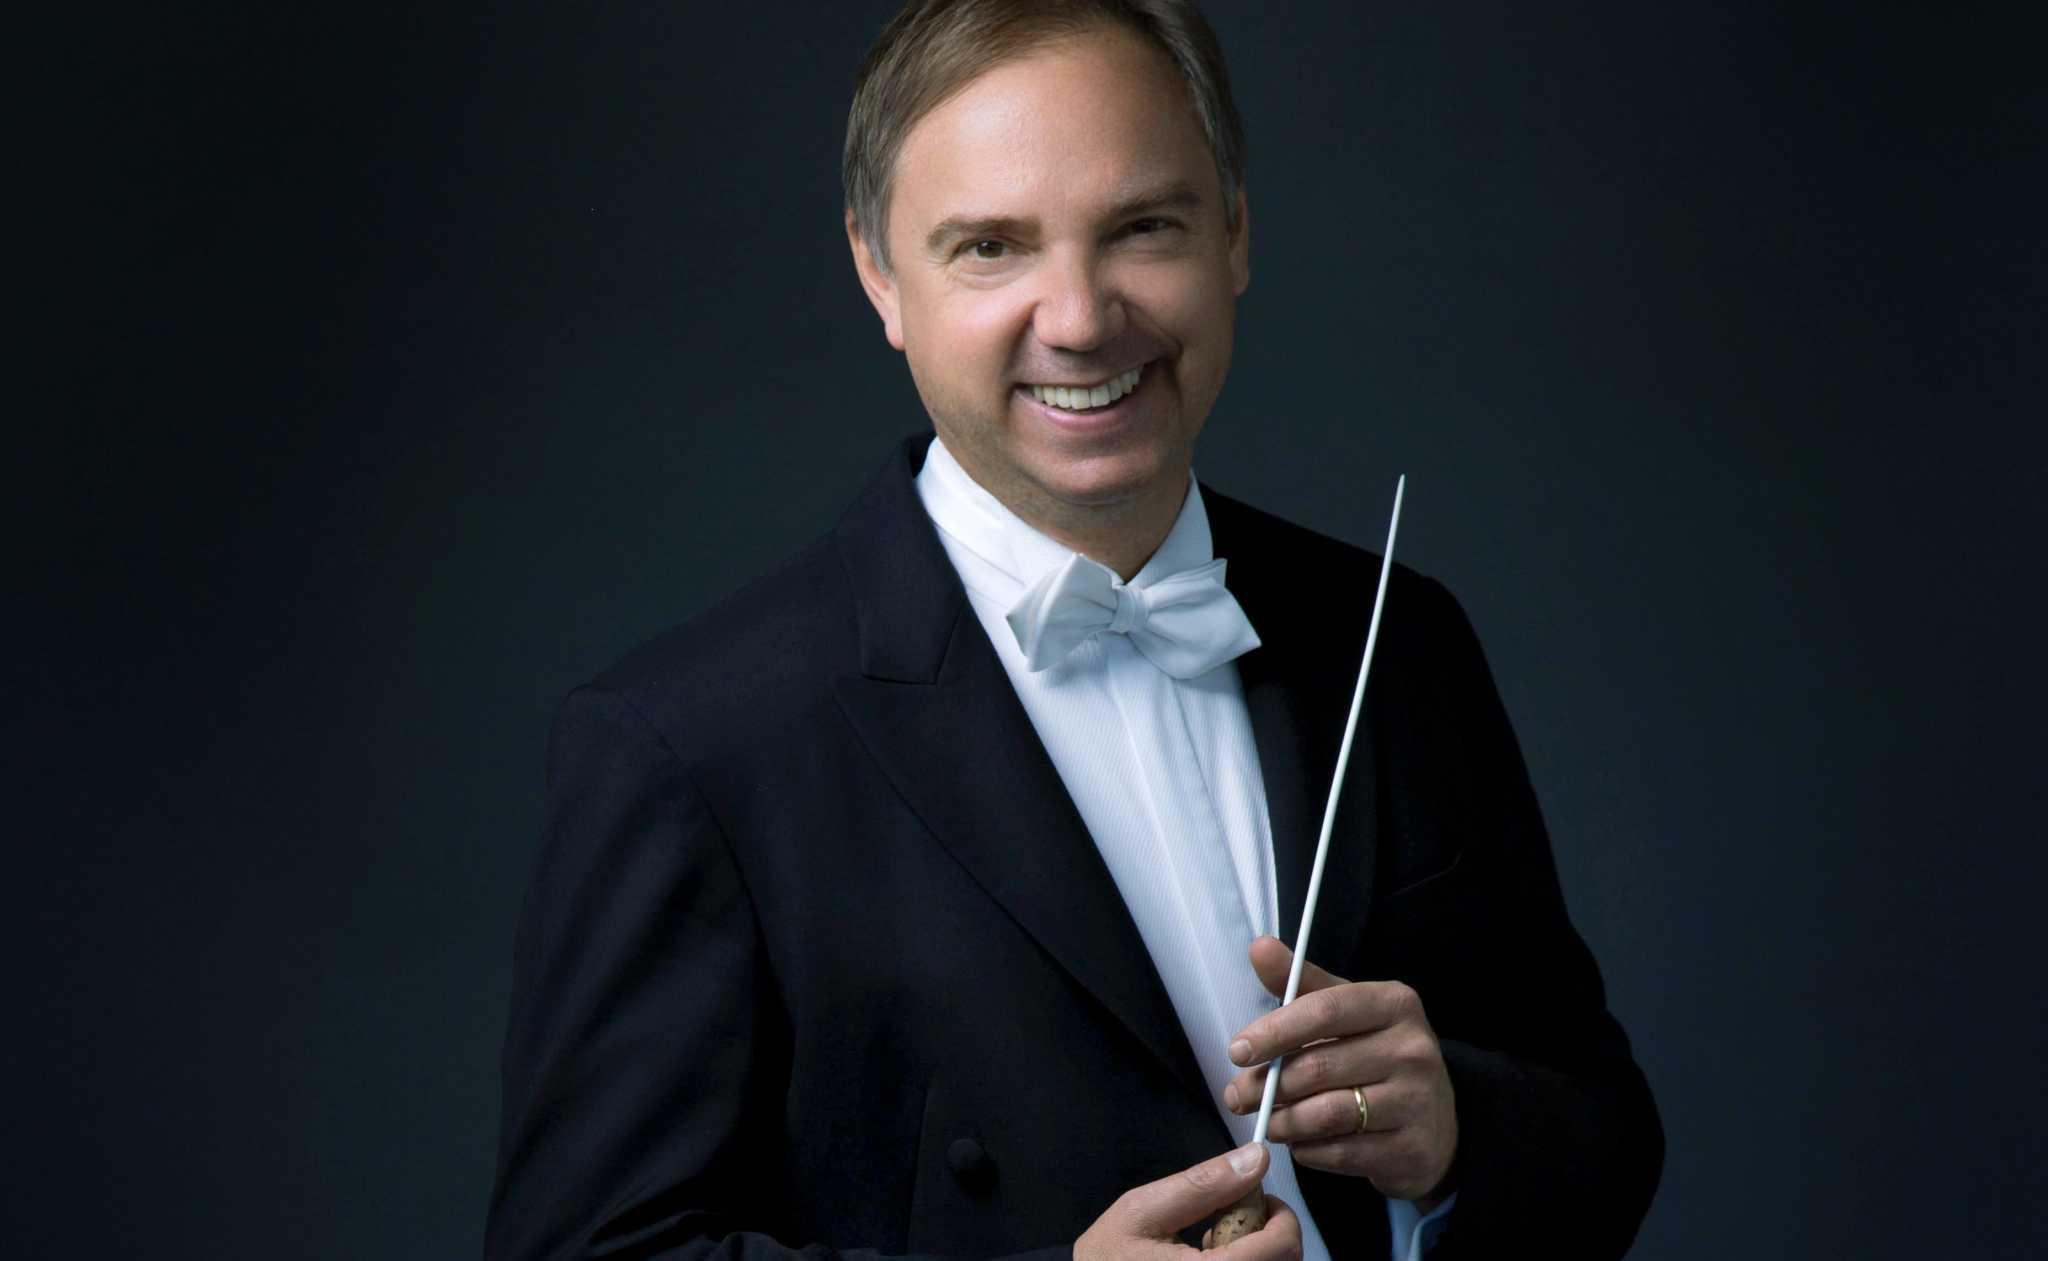 Review: San Antonio Symphony, Mastersingers celebrate milestones with a power Mahler concert